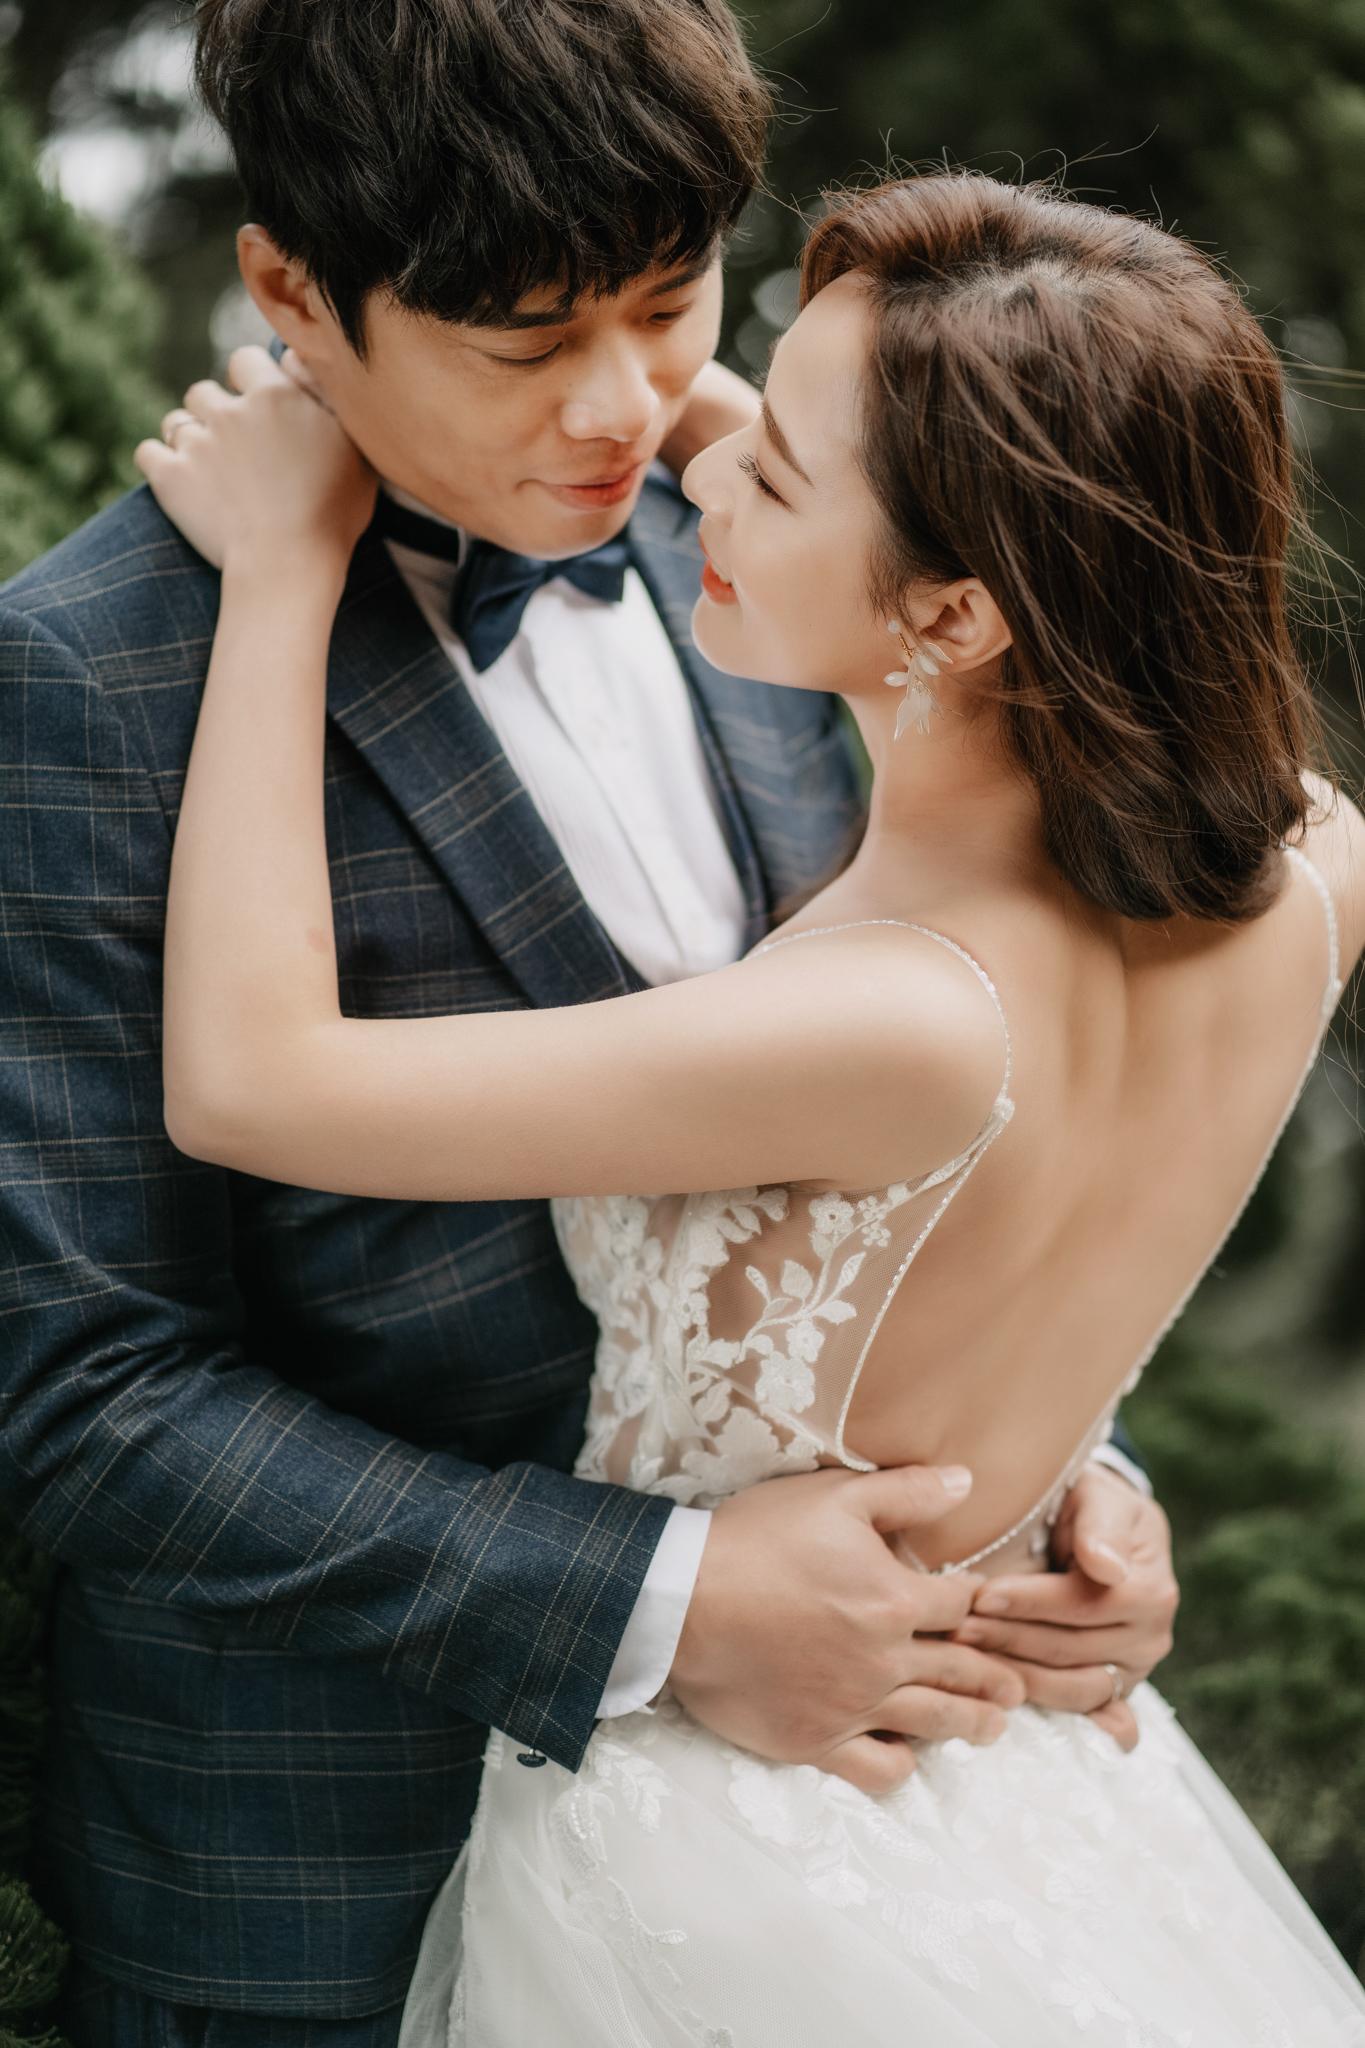 EASTERN WEDDING, Donfer, 自助婚紗, 東法